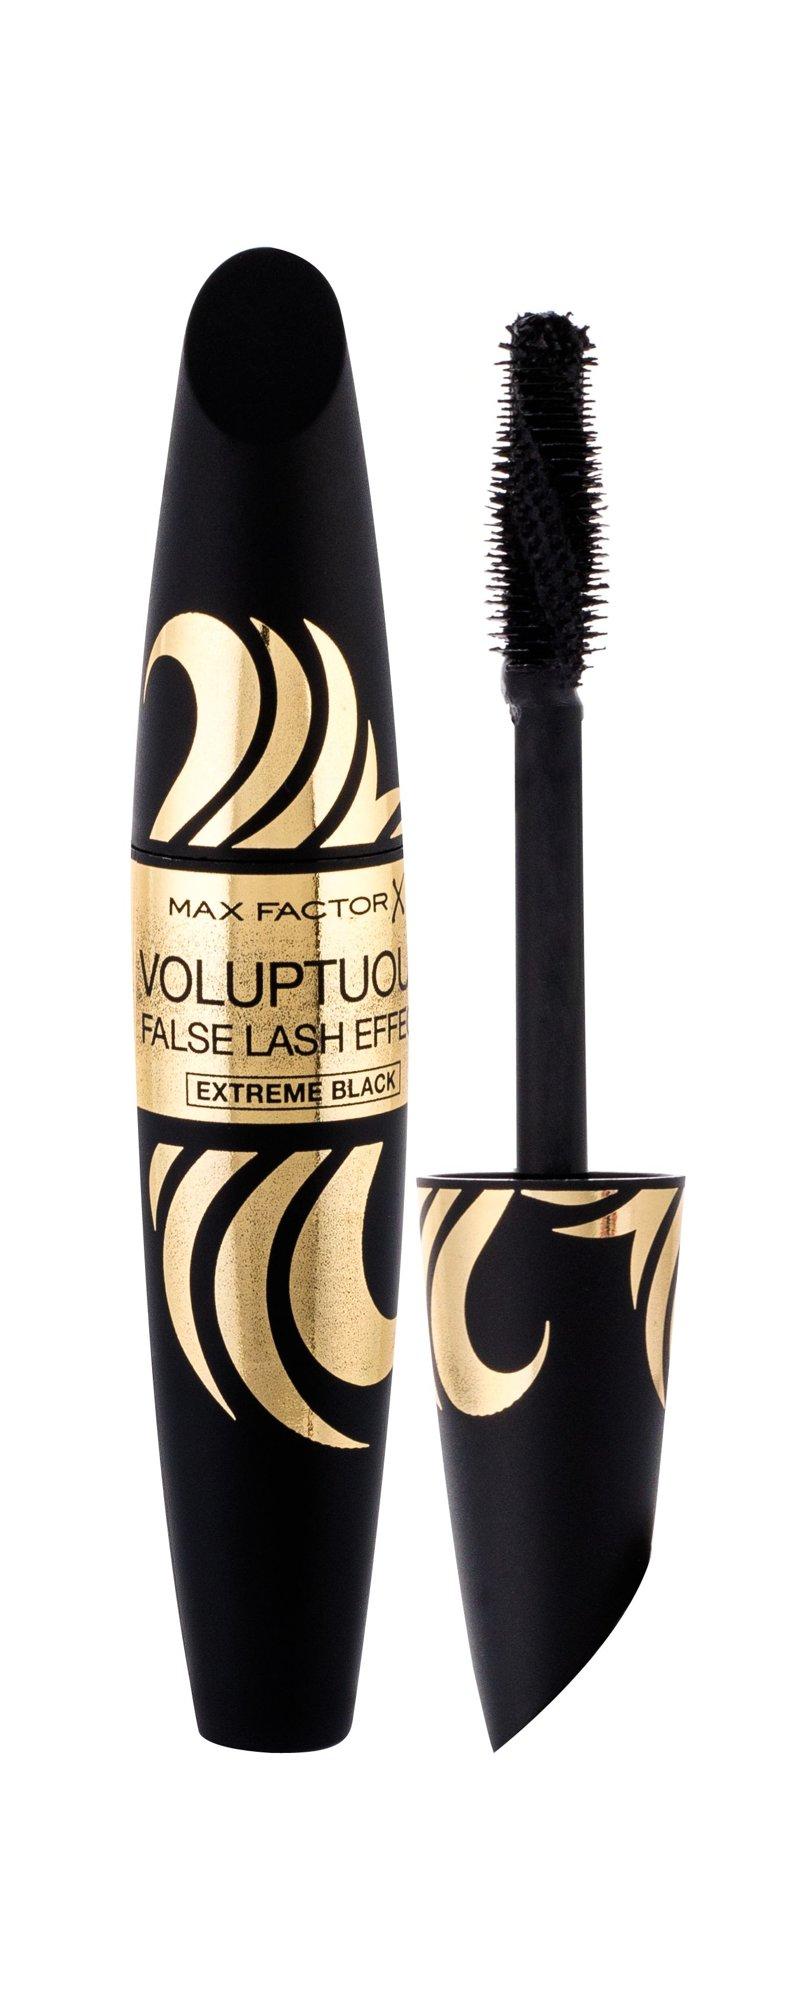 Max Factor Voluptuous False Lash Effect Mascara 13,1ml Extreme Black